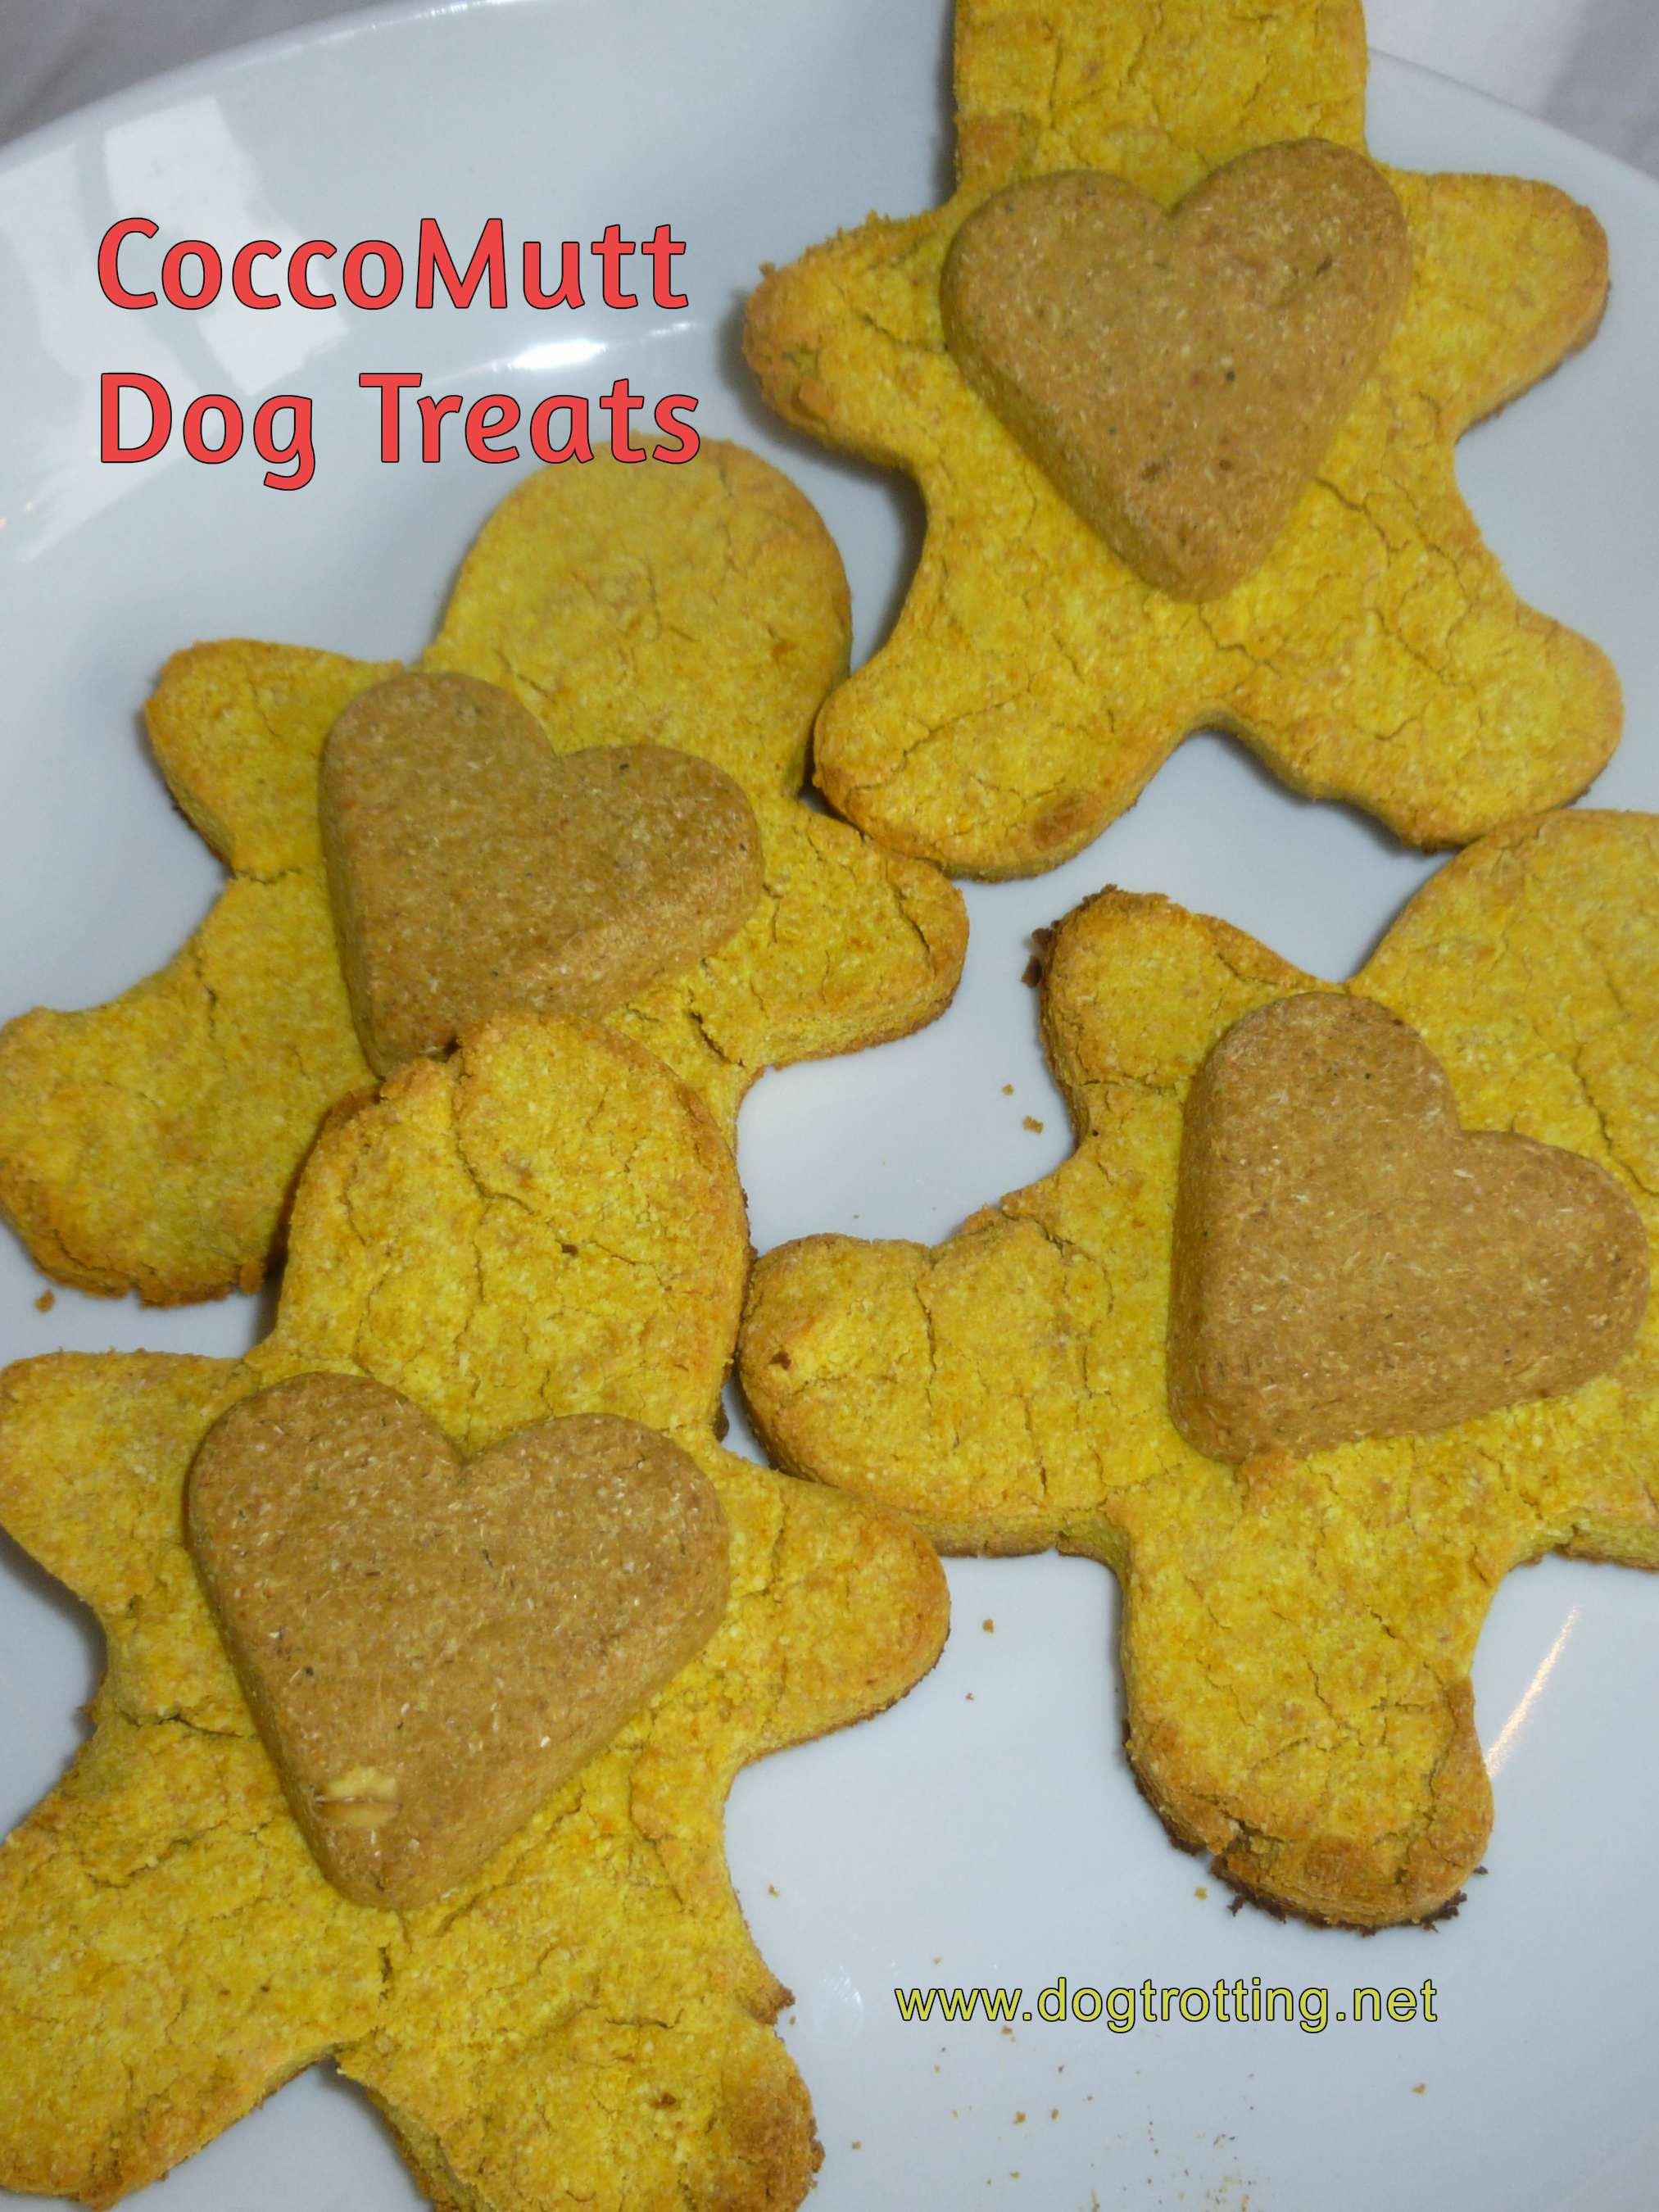 Recipe: CoccoMutt Dog Treats